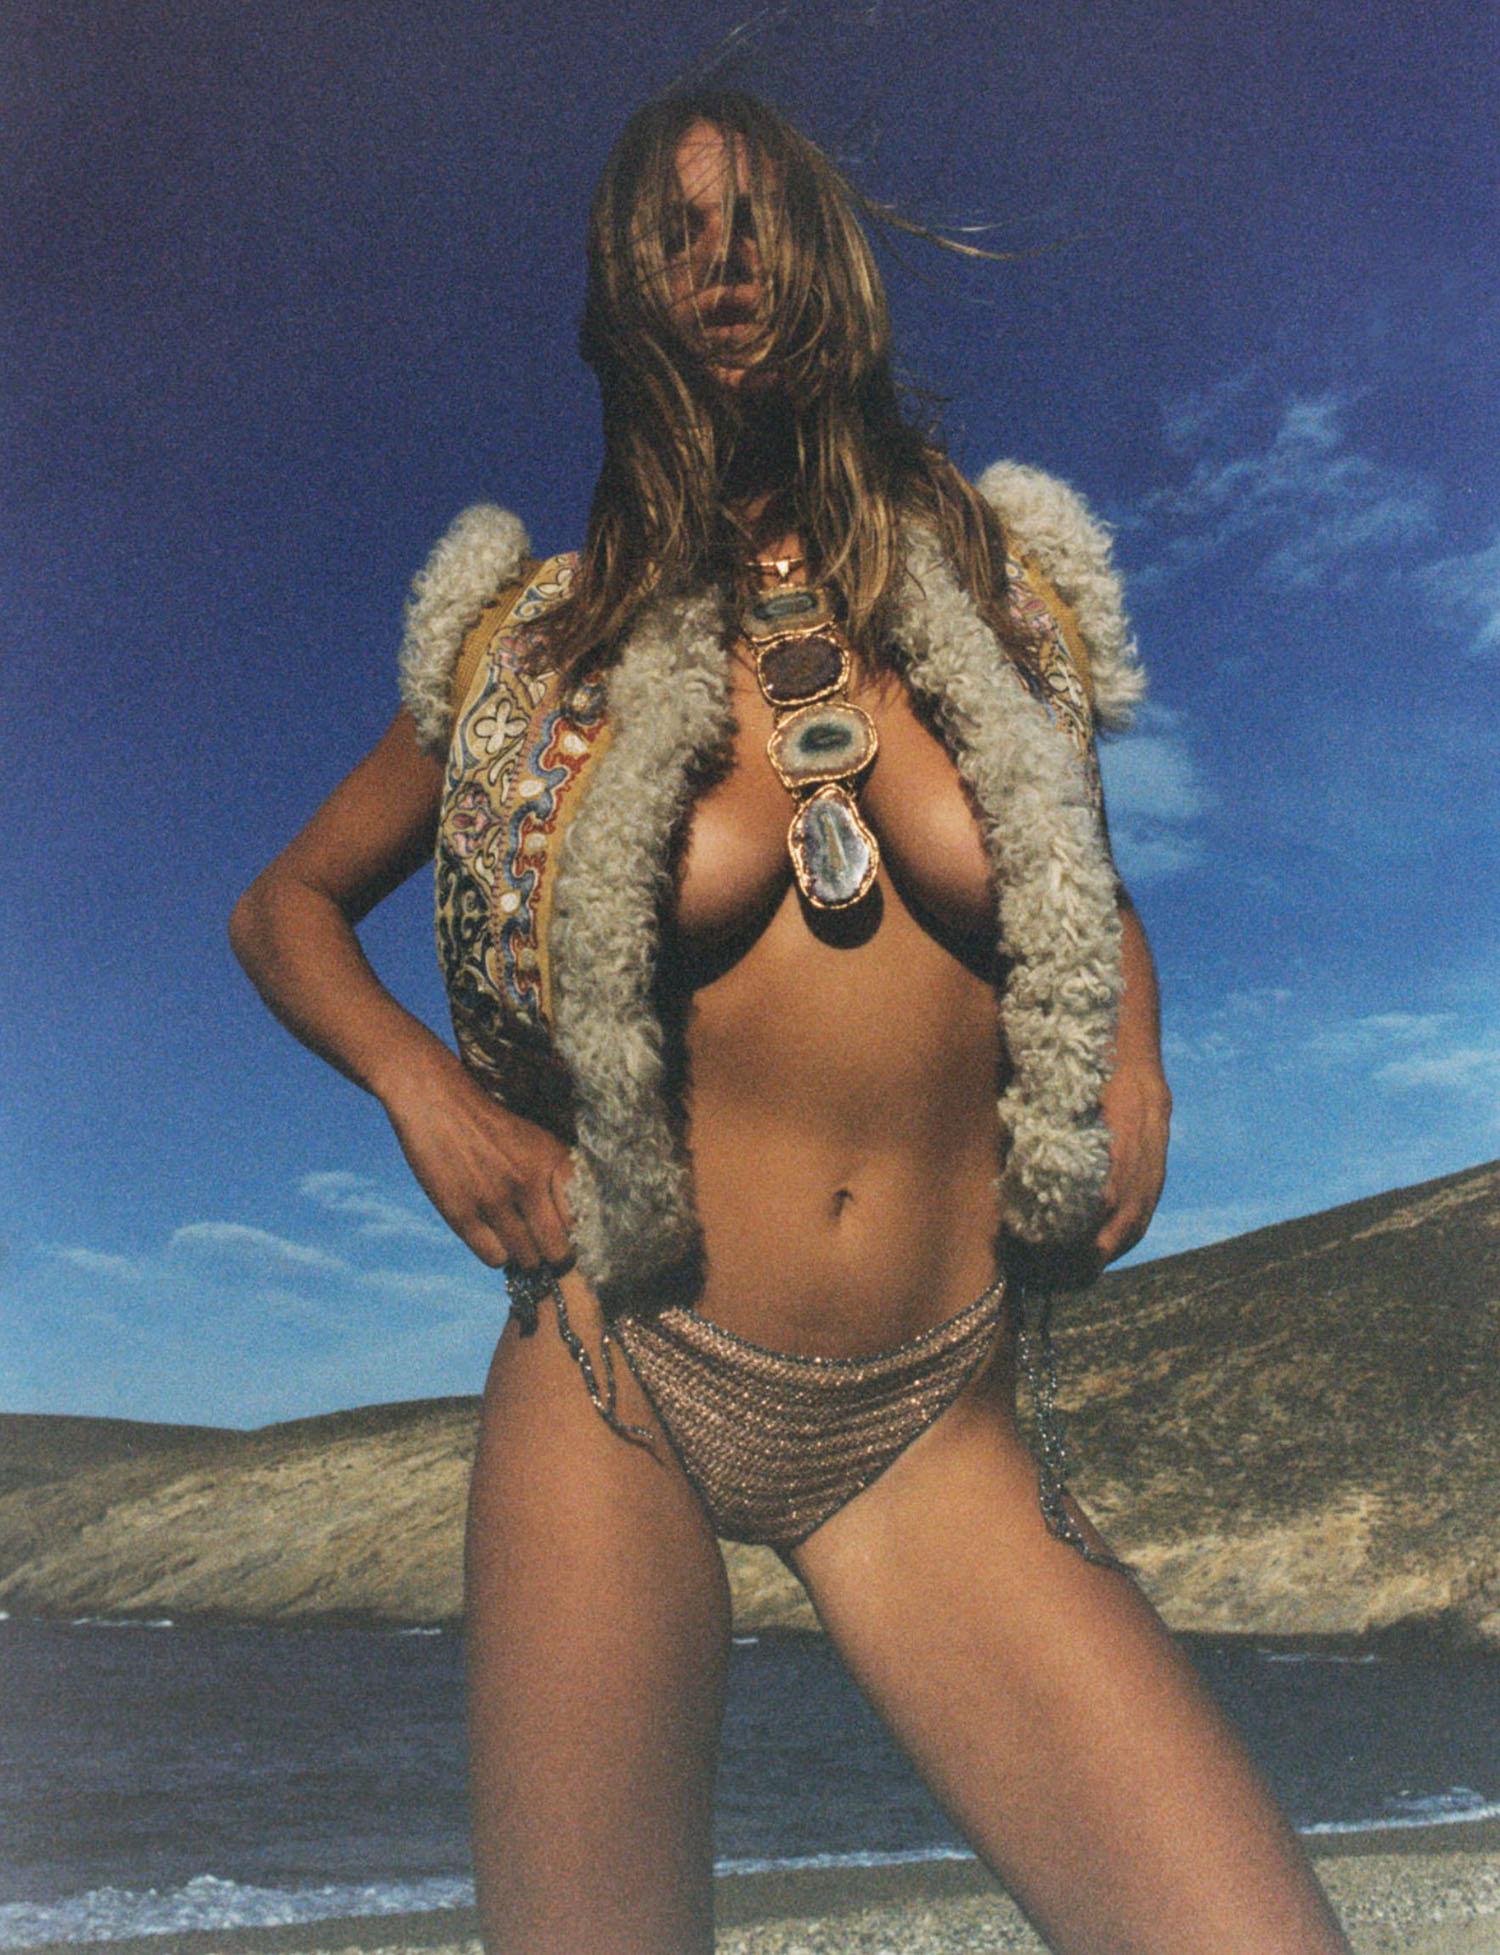 Anna Ewers by Henrik Purienne for Vogue Paris August 2021